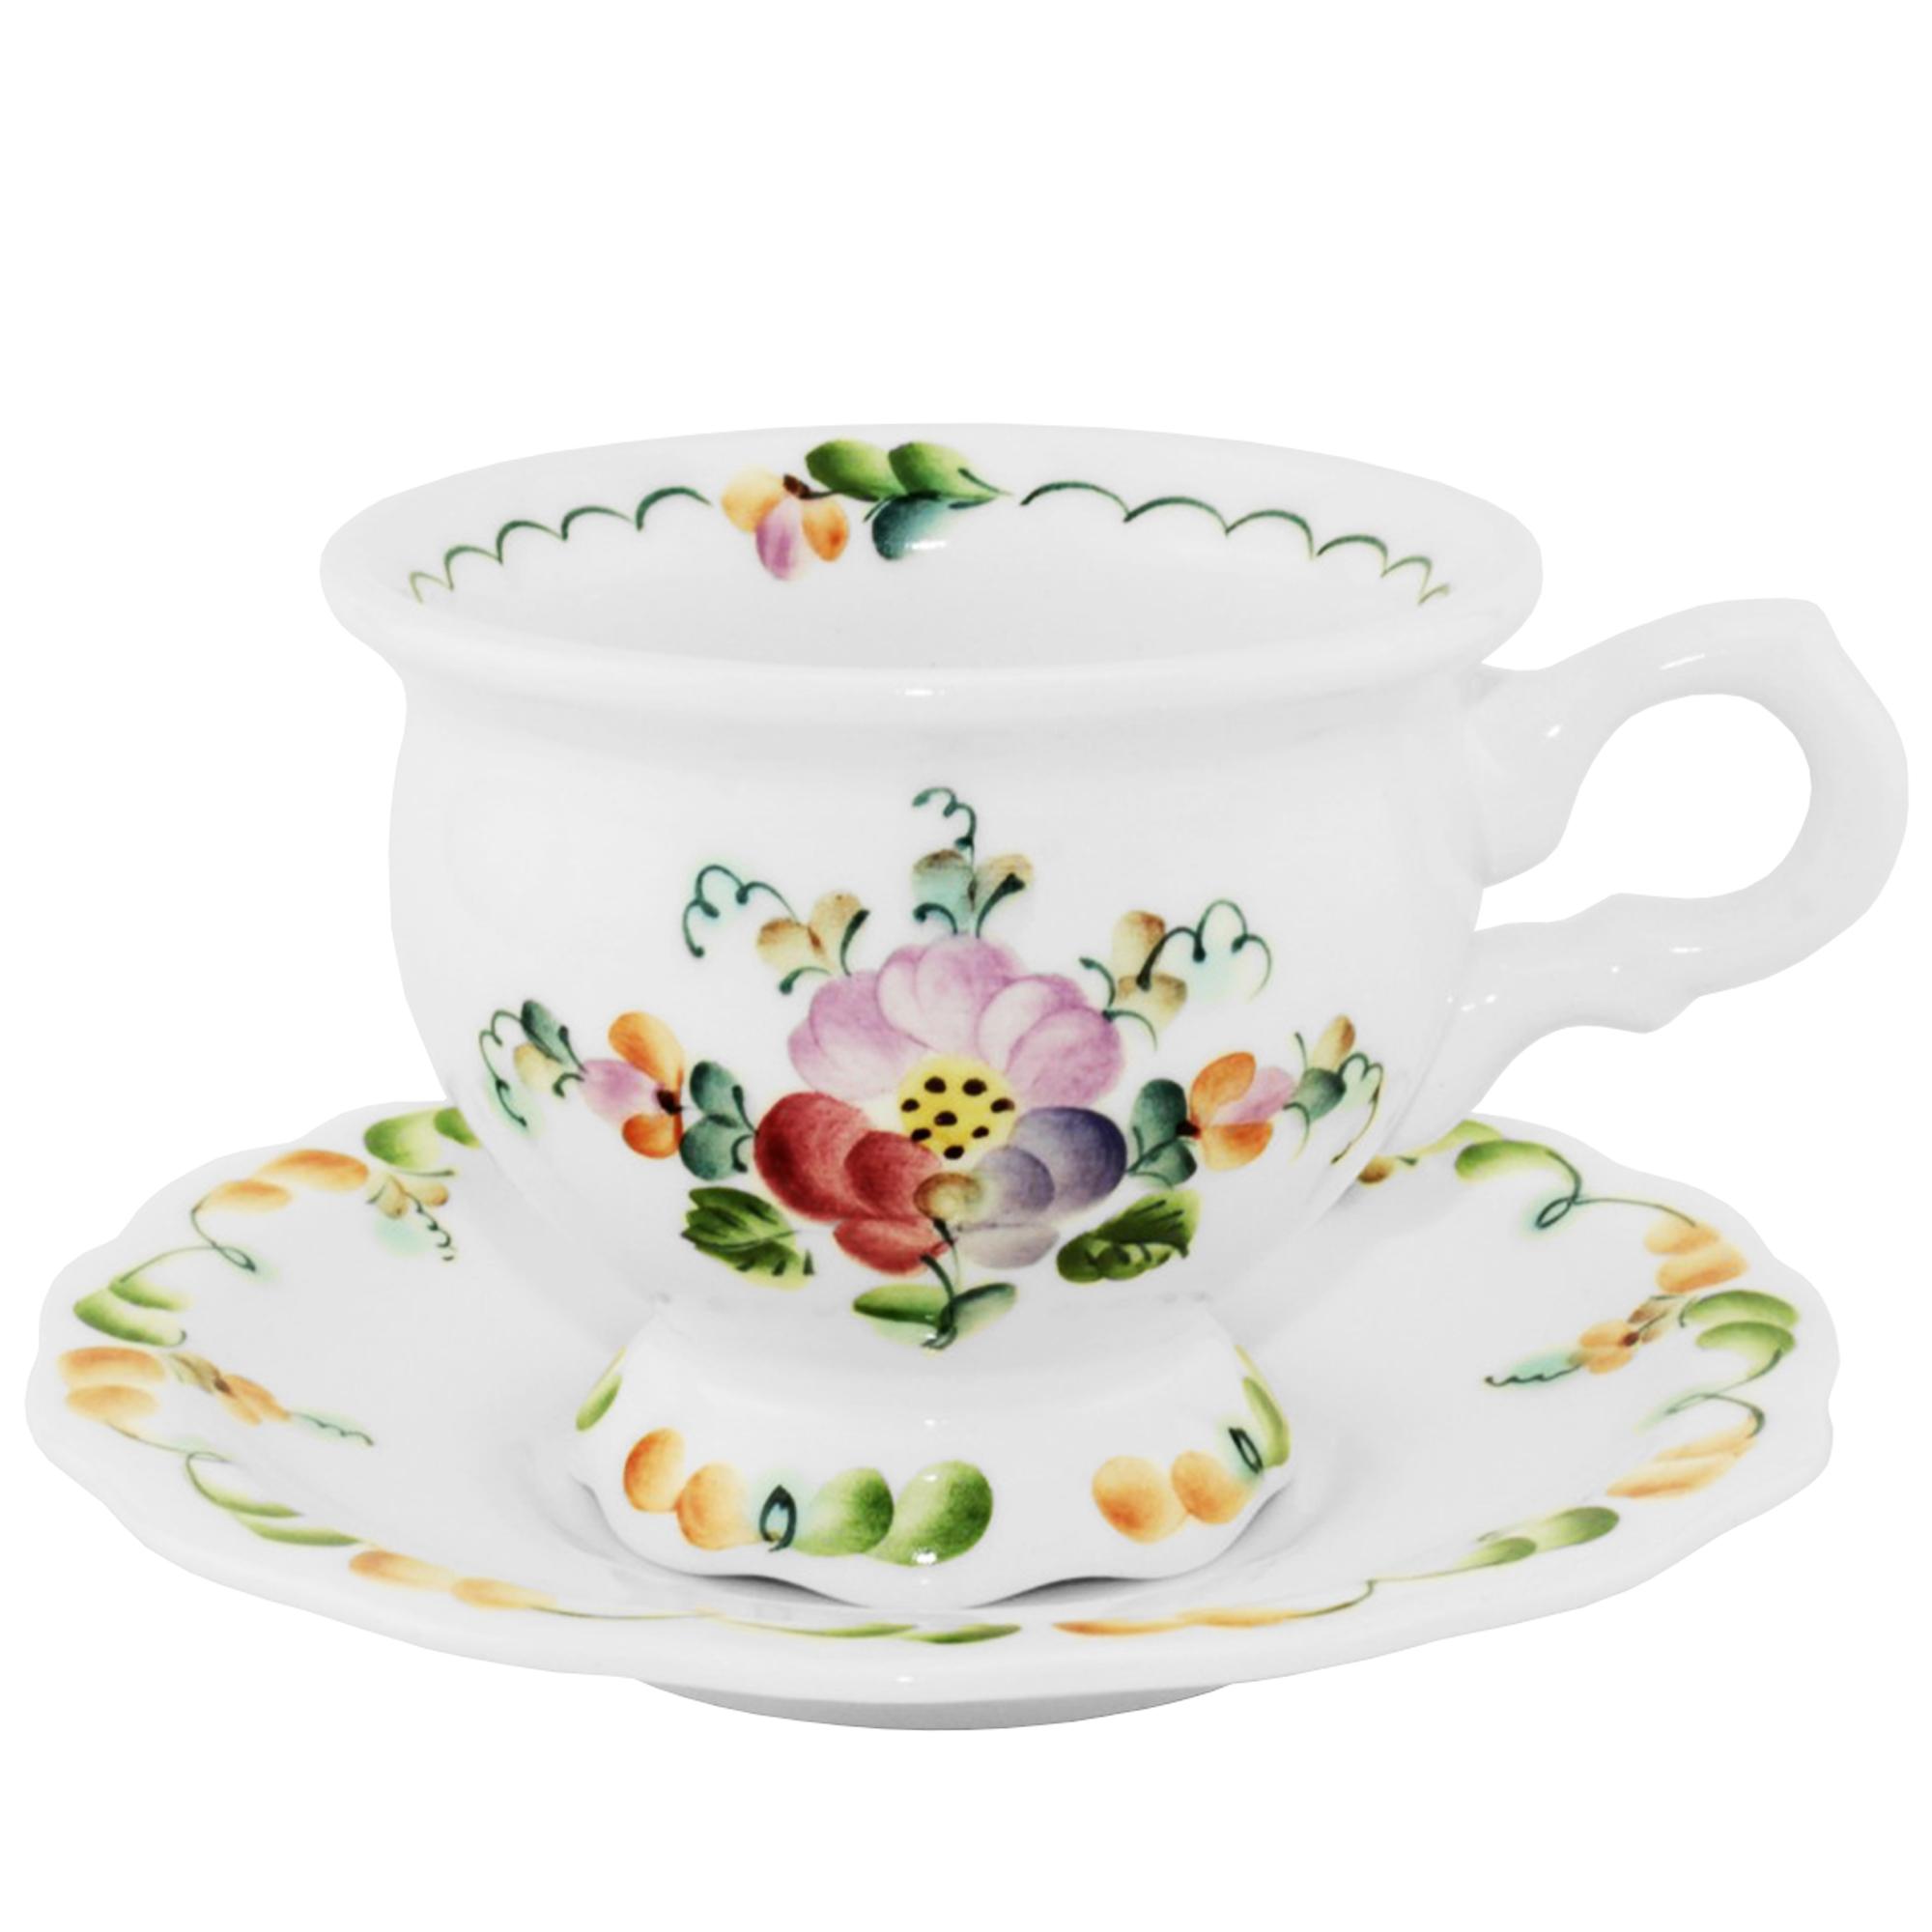 Фото - Пара чайная Анастасия Семикаракорская керамика 240 мл чайная пара mercury 150 мл керамика